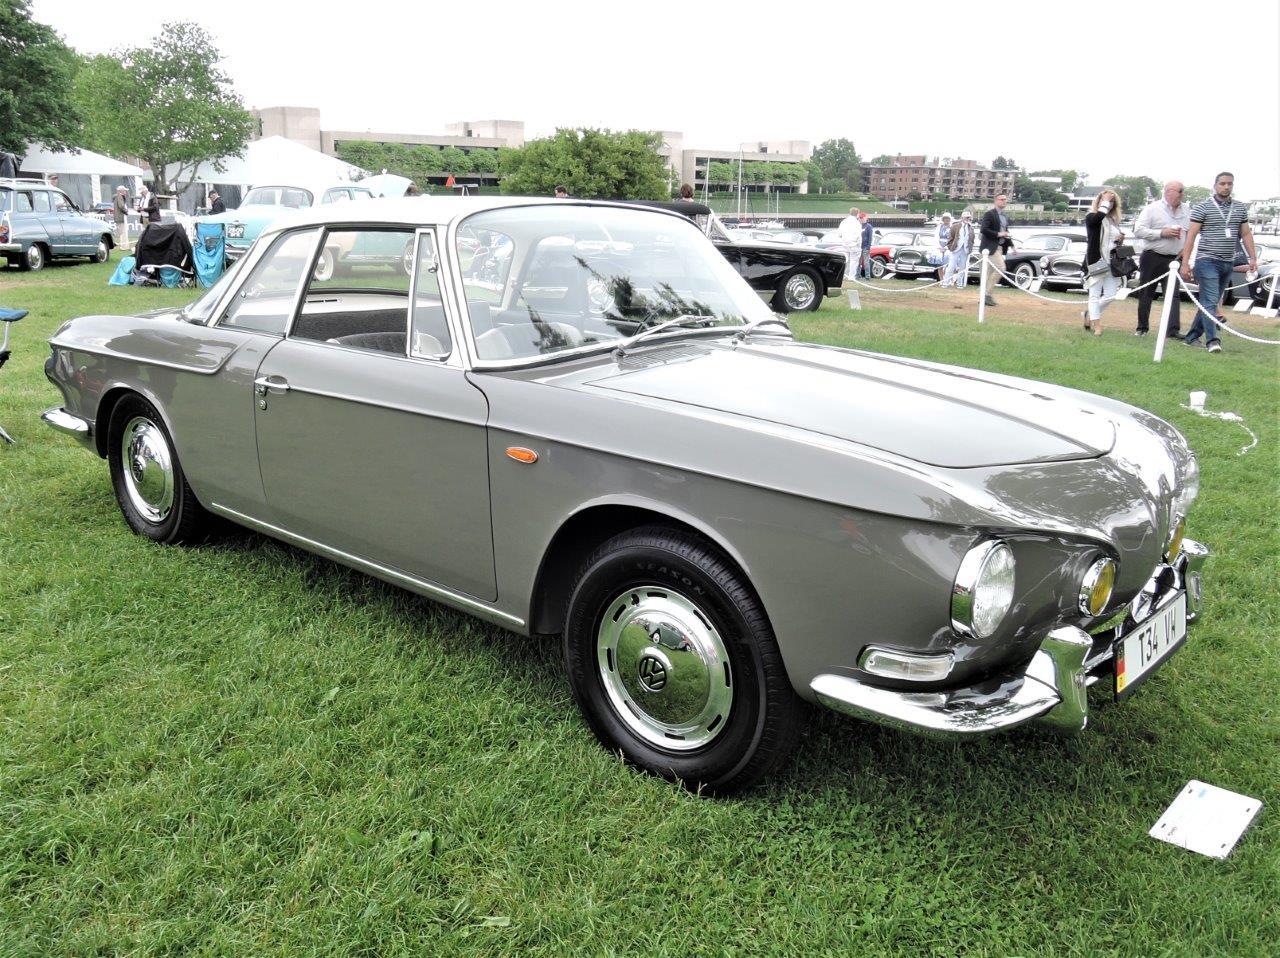 grey 1963 Volkswagen Type 34 - 2018 Greenwich Concours International